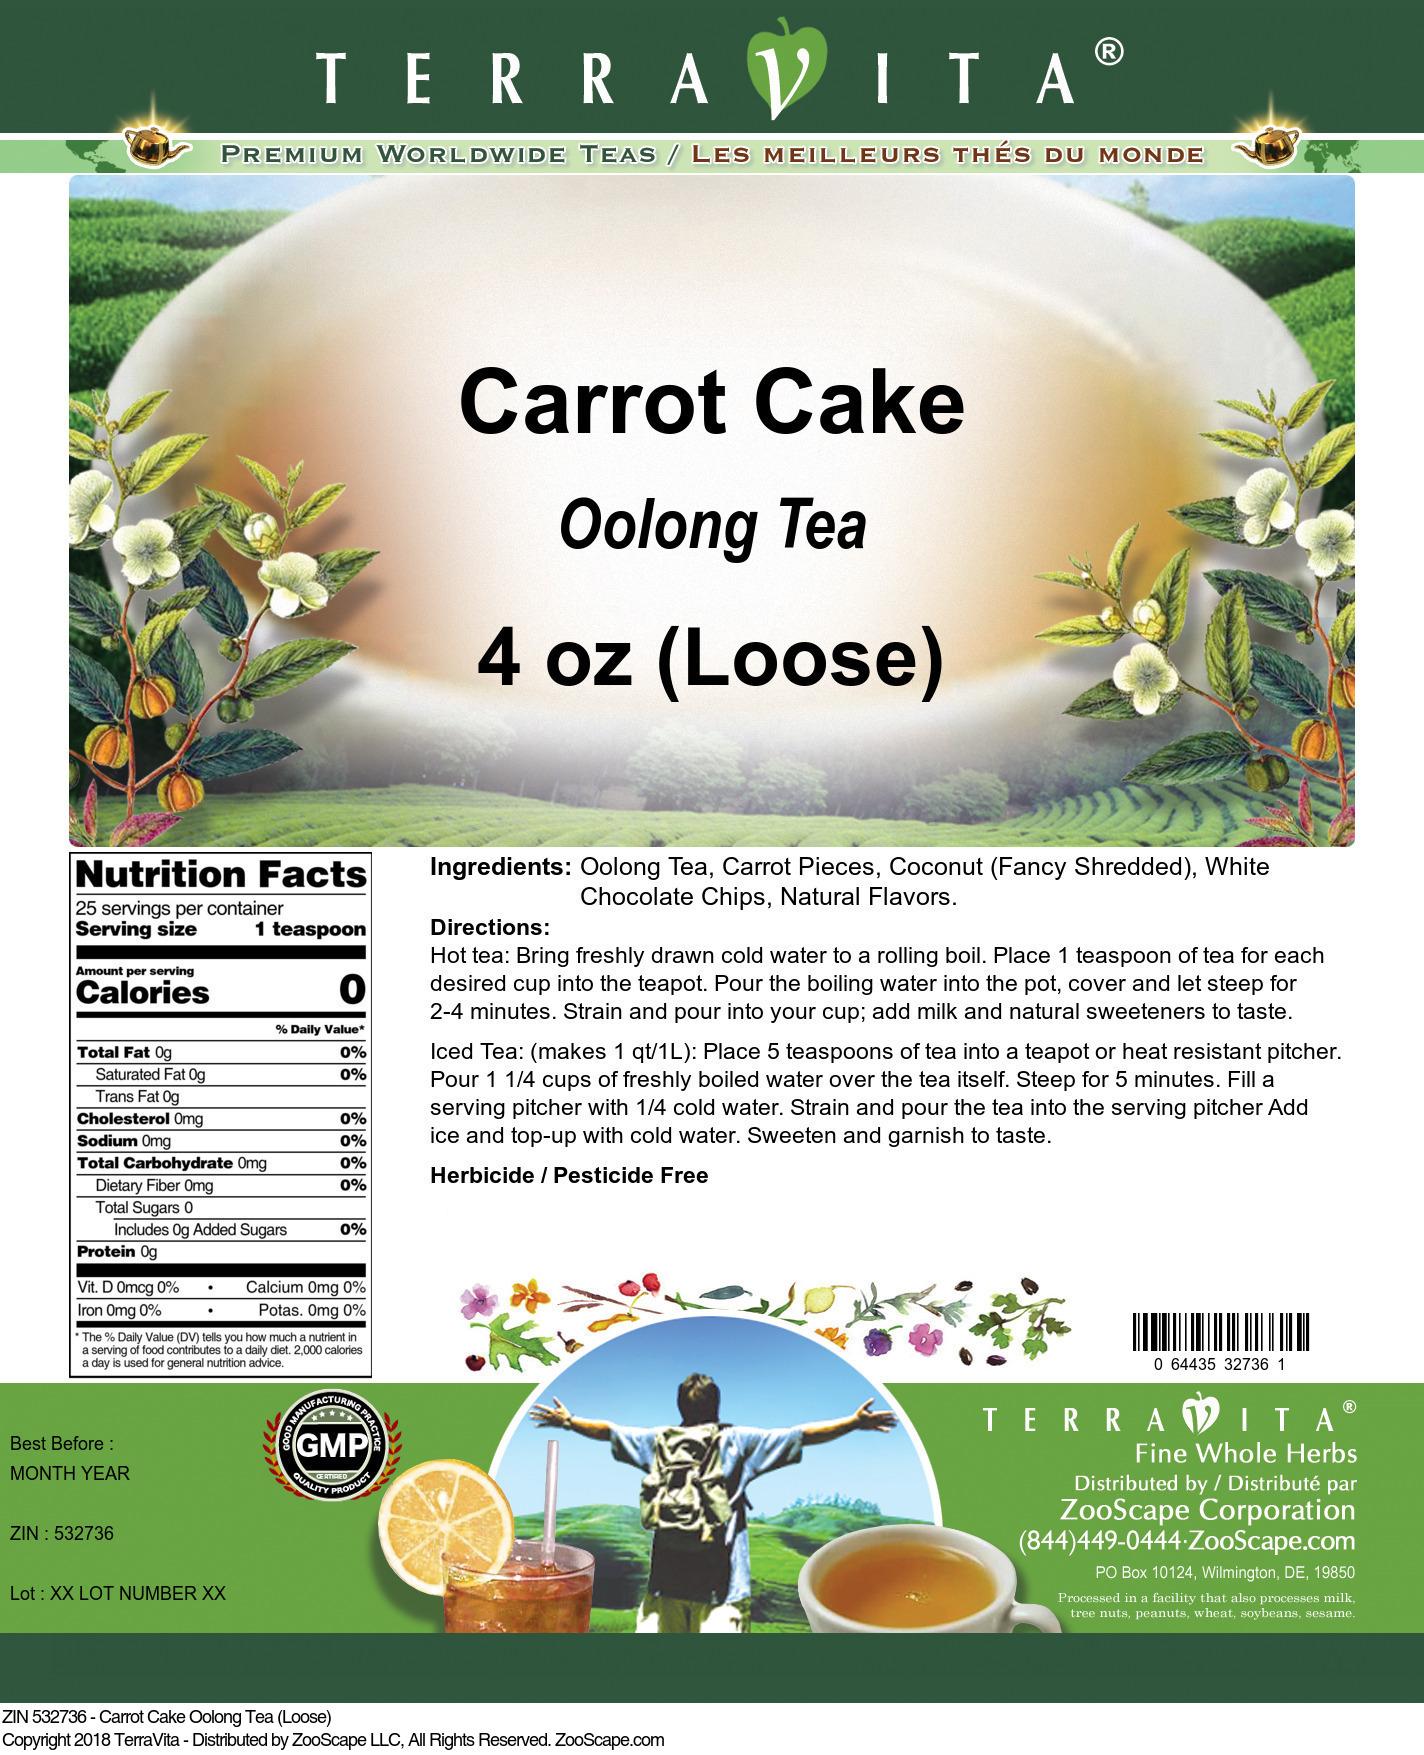 Carrot Cake Oolong Tea (Loose)